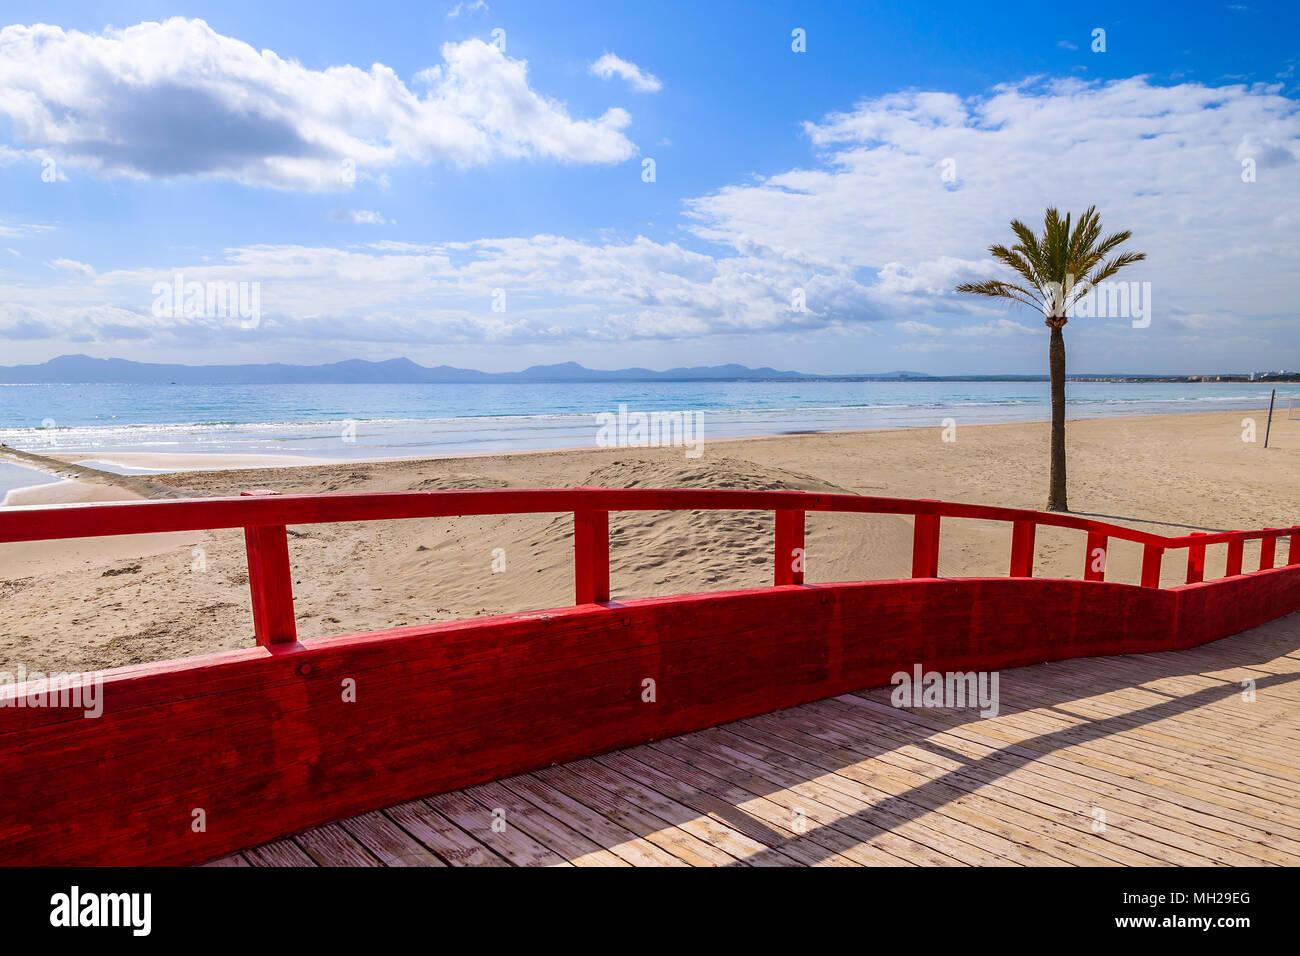 Footbridge on Alcudia beach, Majorca island, Spain - Stock Image